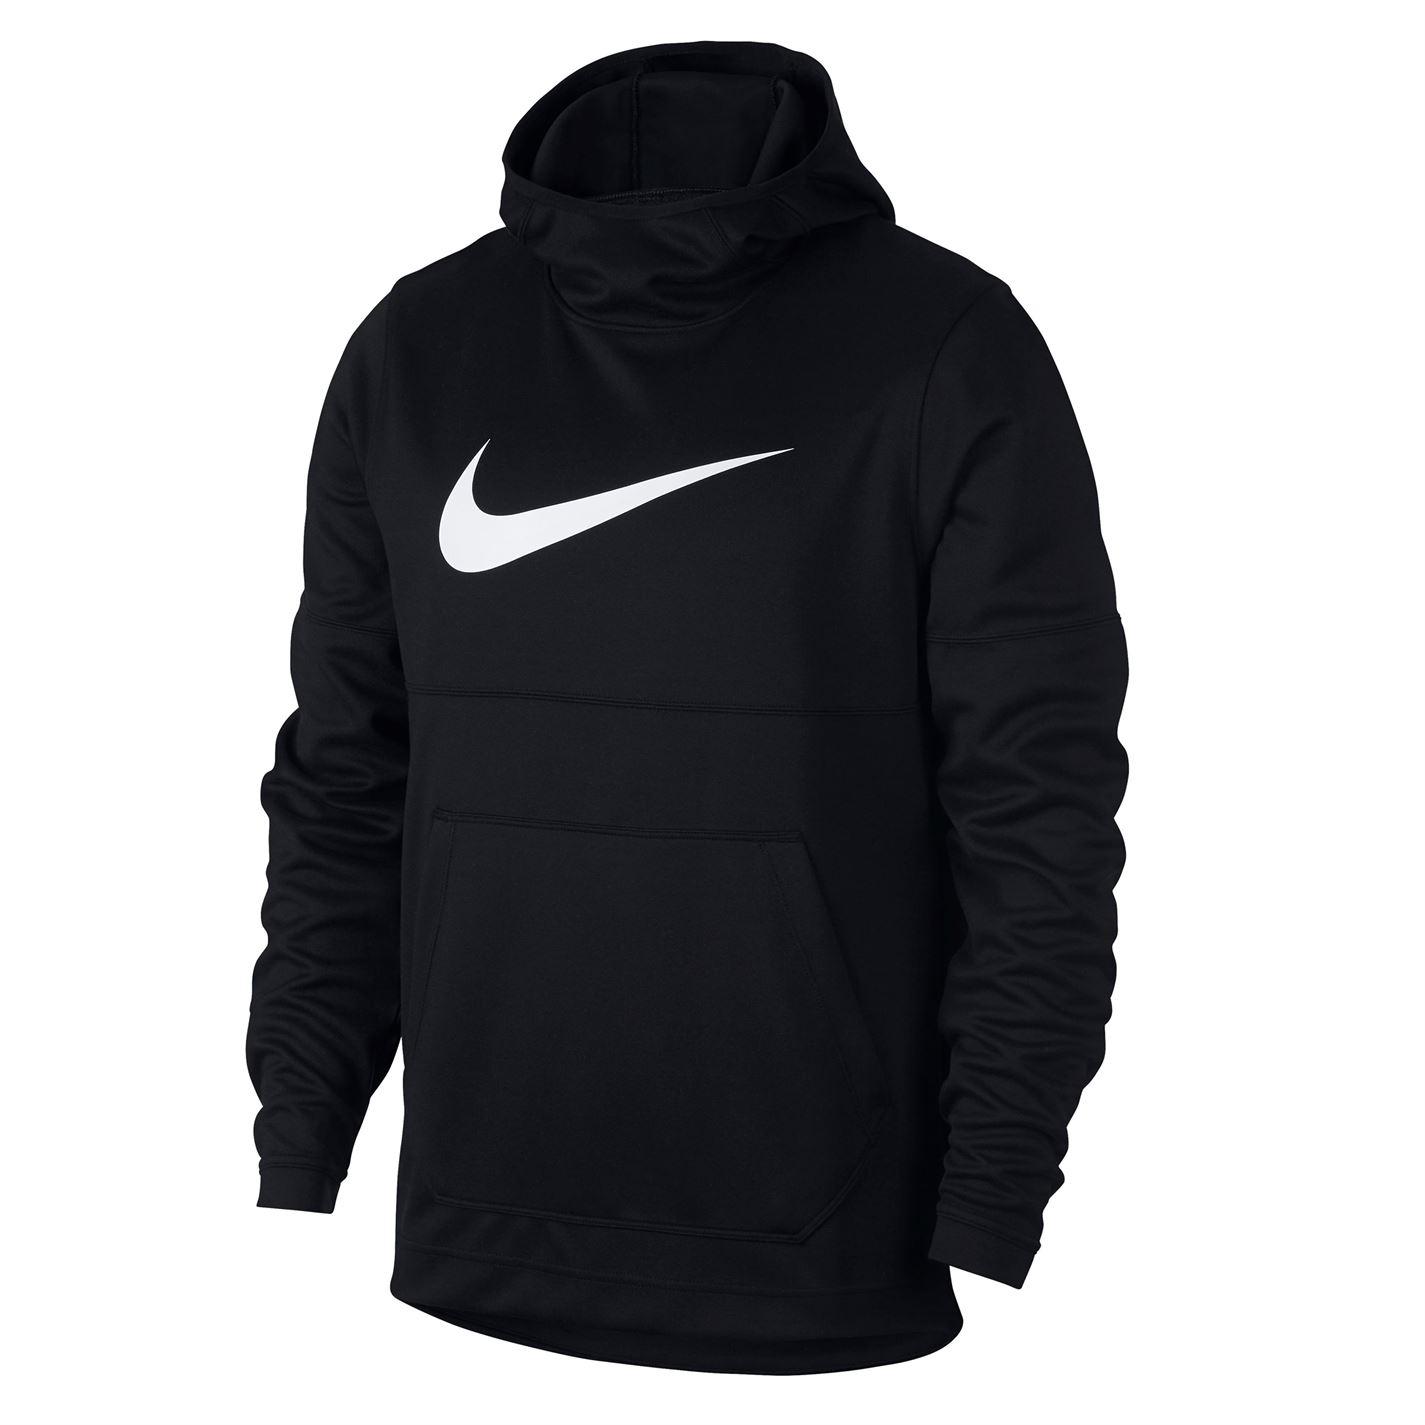 73d6b70832 Melegítő felső Nike Spotlight OTH Hoody Mens - Glami.hu